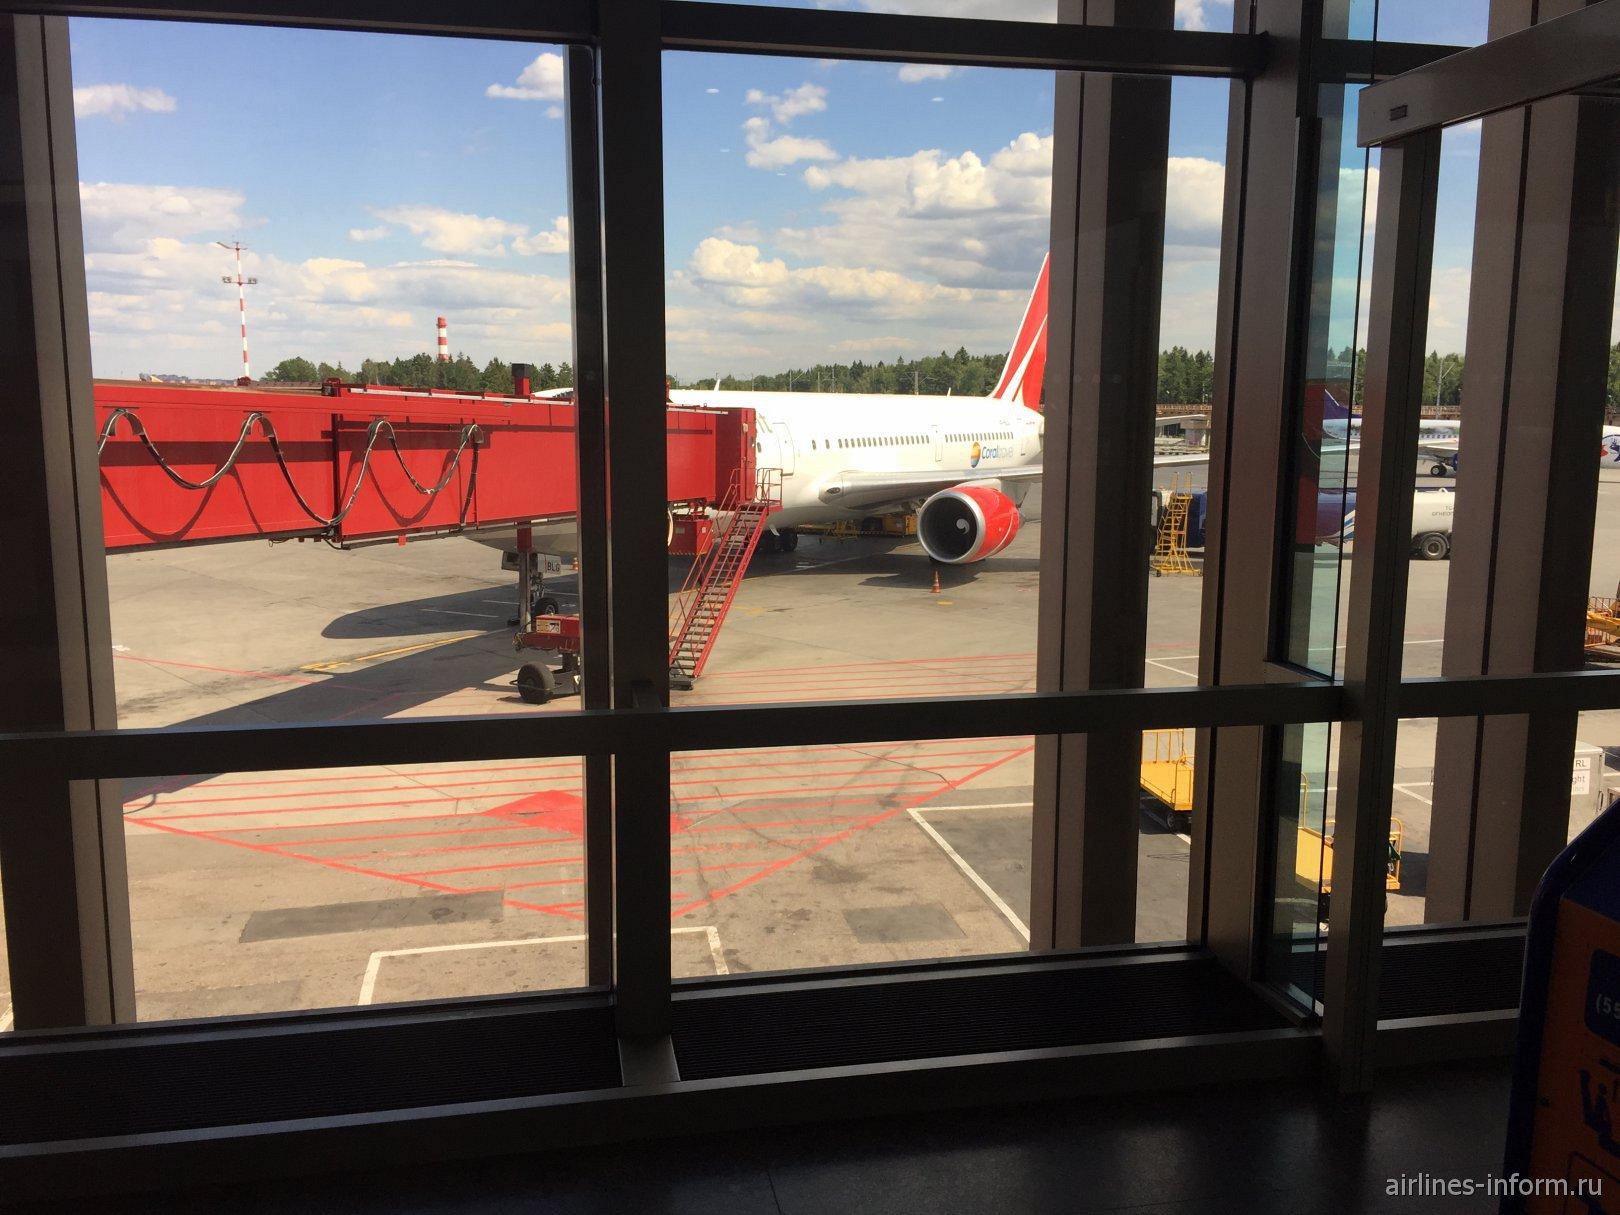 Прошёл я через весь терминал и вижу самолёт на котором я полечу